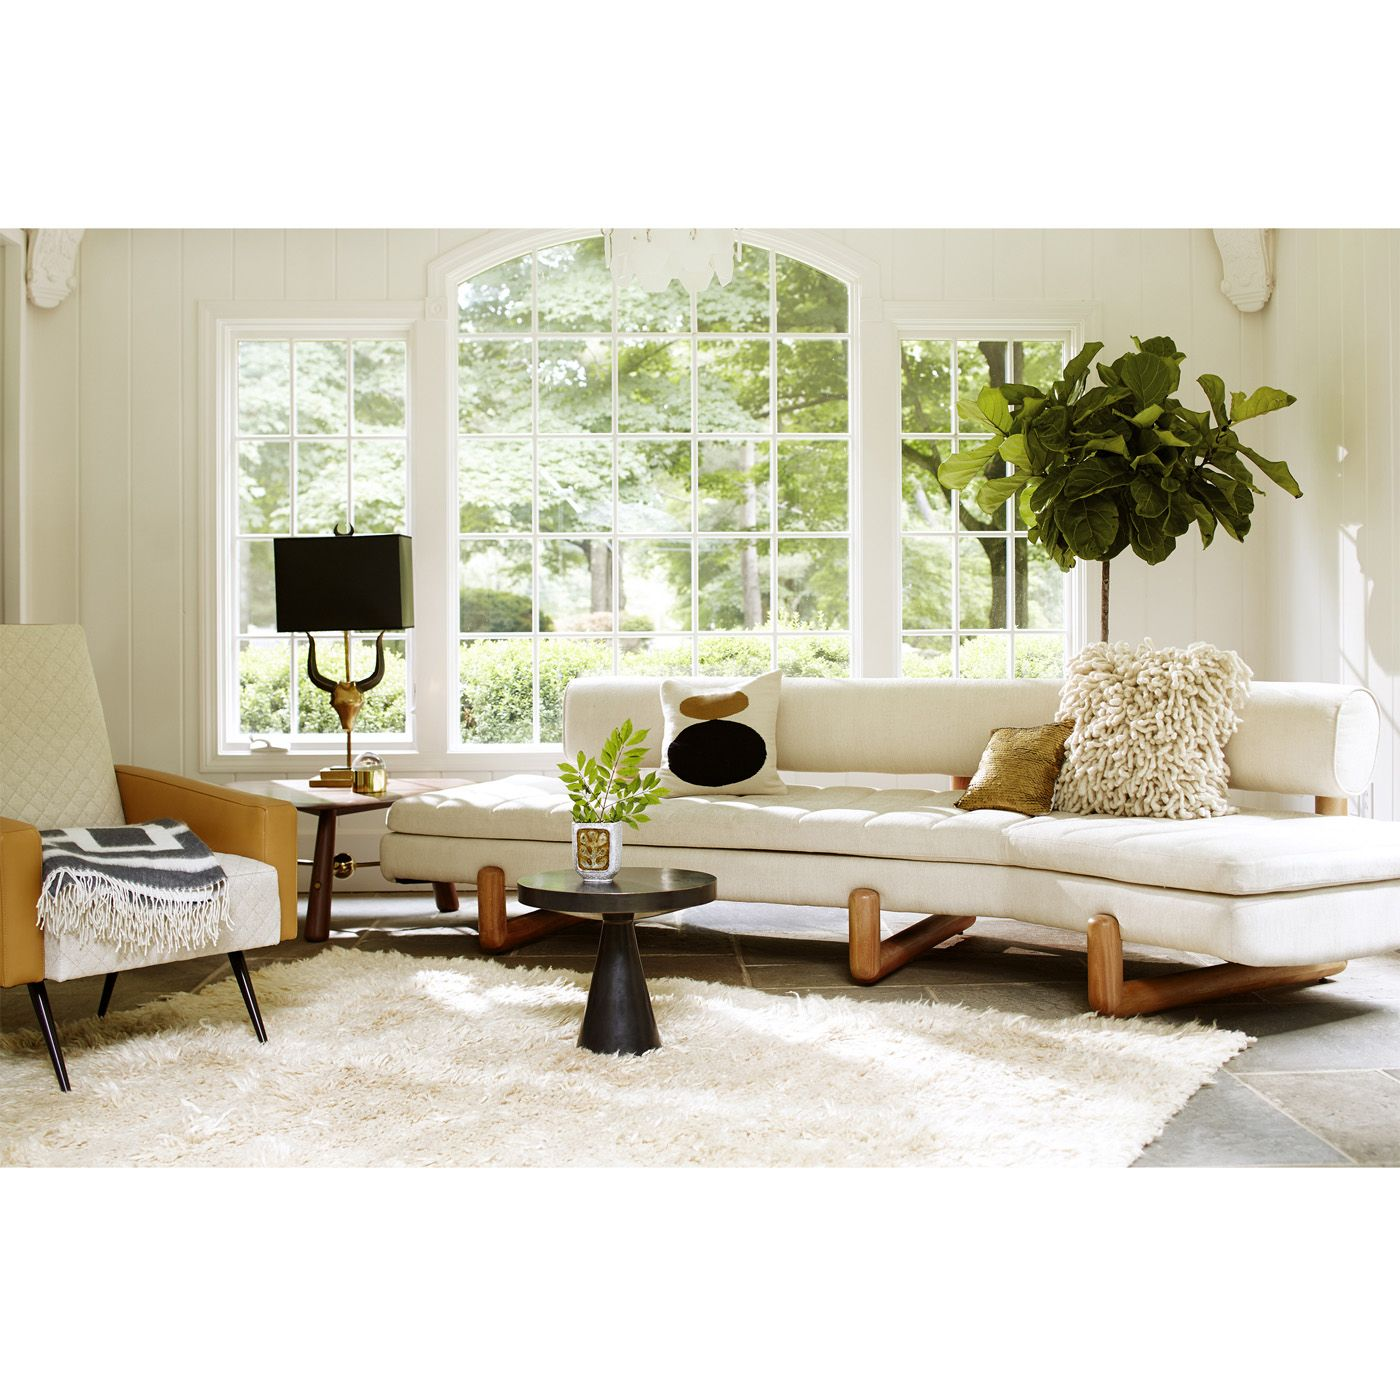 Sofas Aspen Sofa Luxury House Interior Design Luxury Home Decor Home Decor